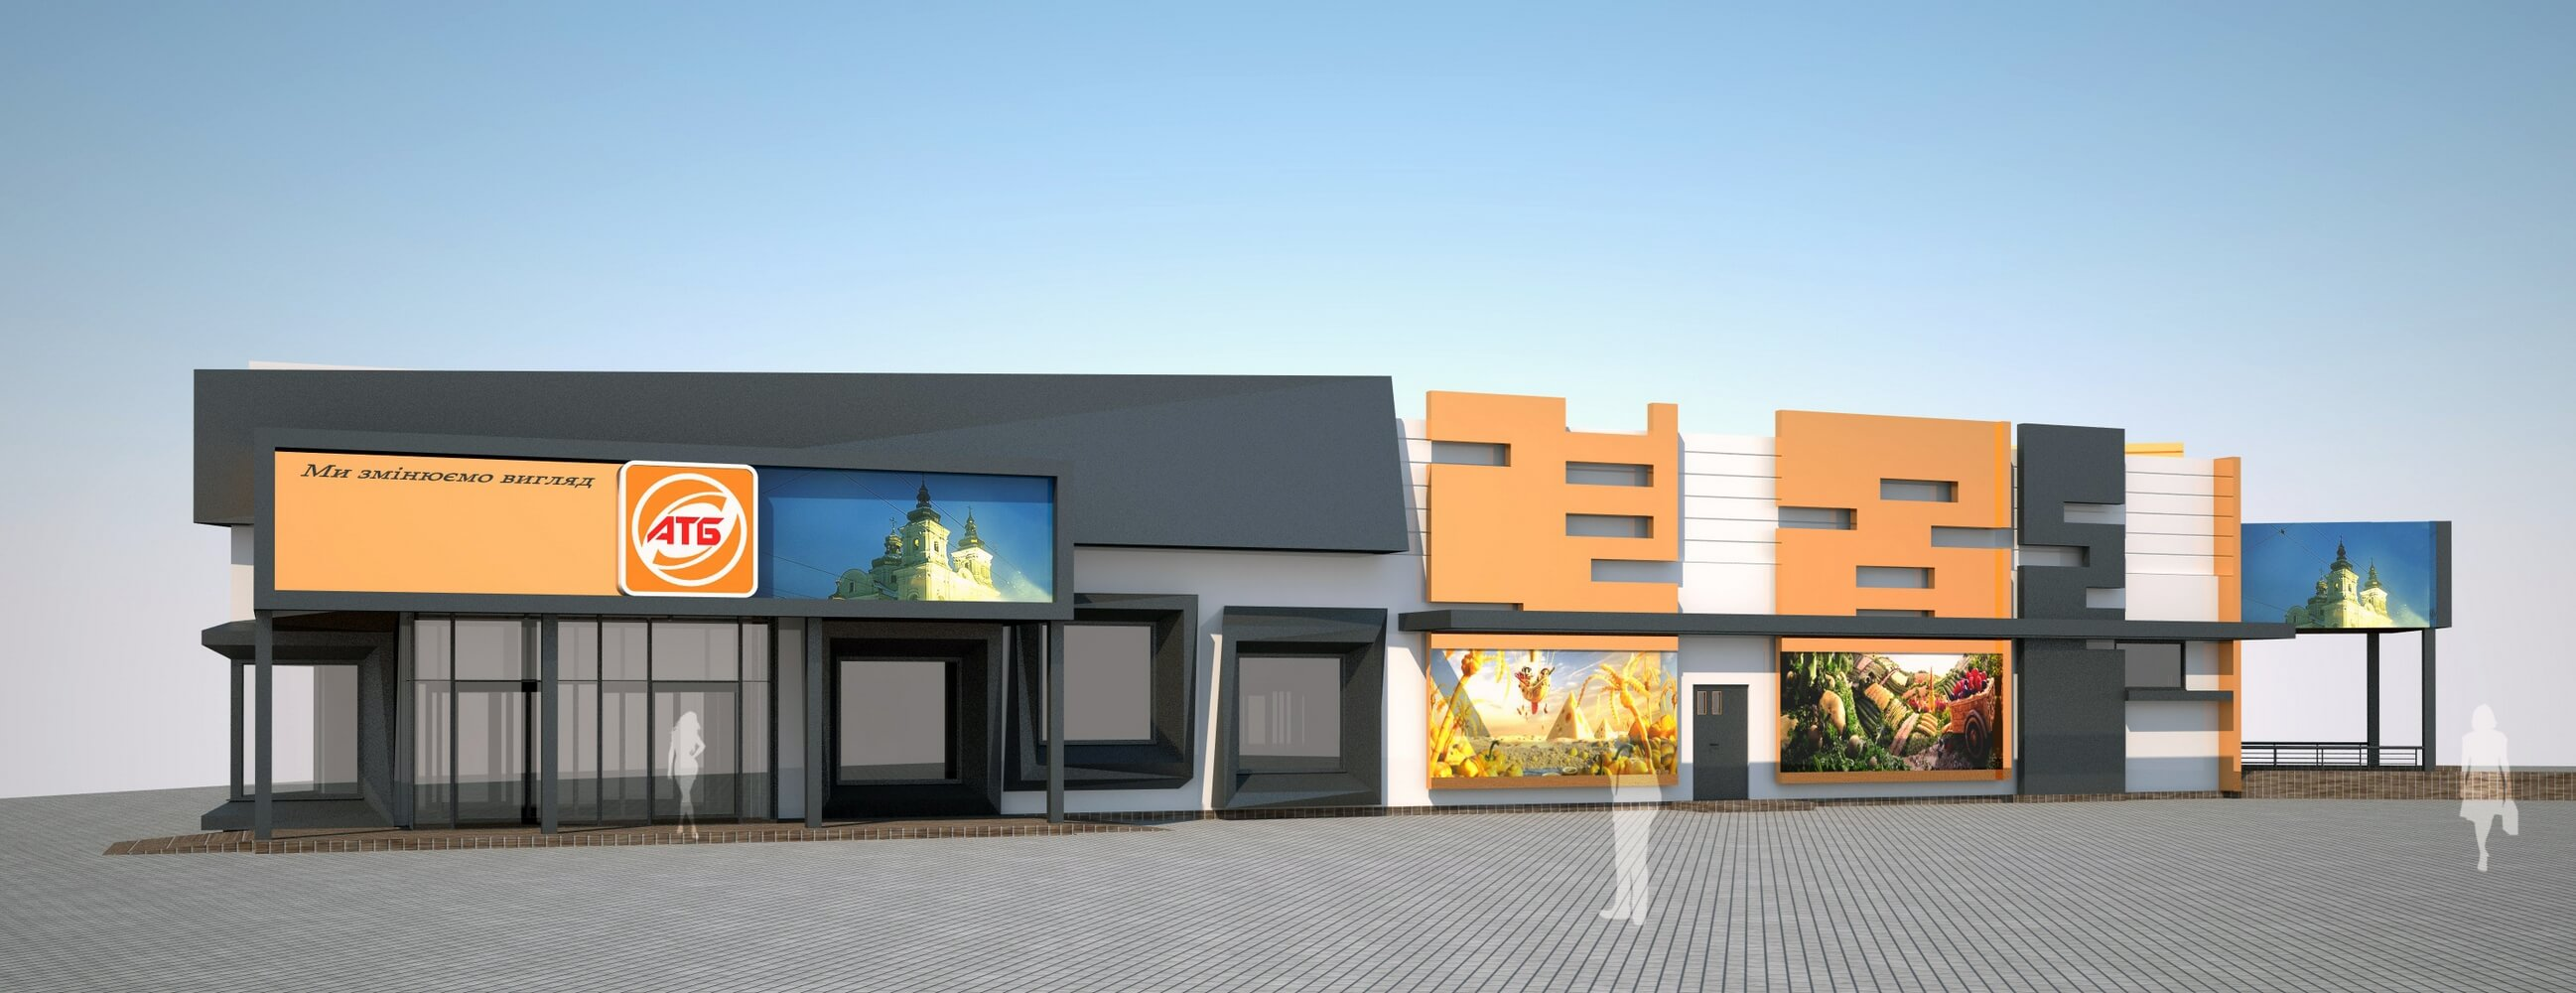 Каскад-Будинвест: проекты компании (изображение 5)